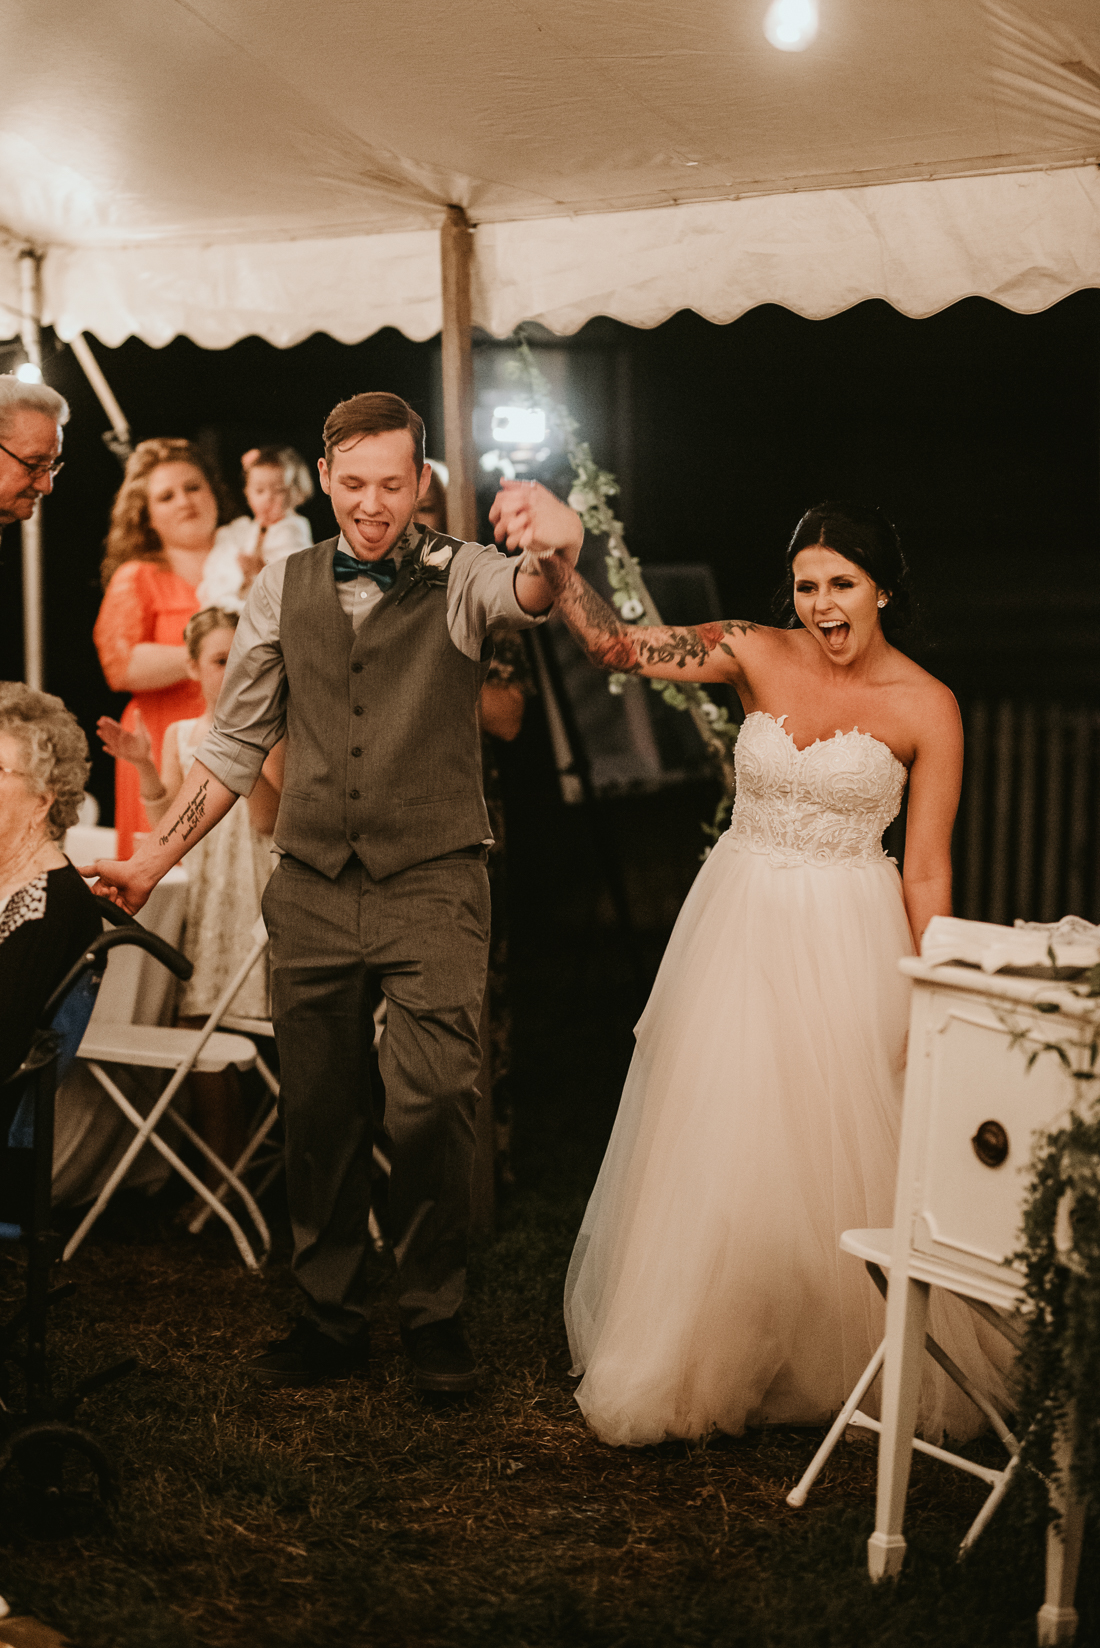 olivia_zay_wedding_09_2018-7823.jpg